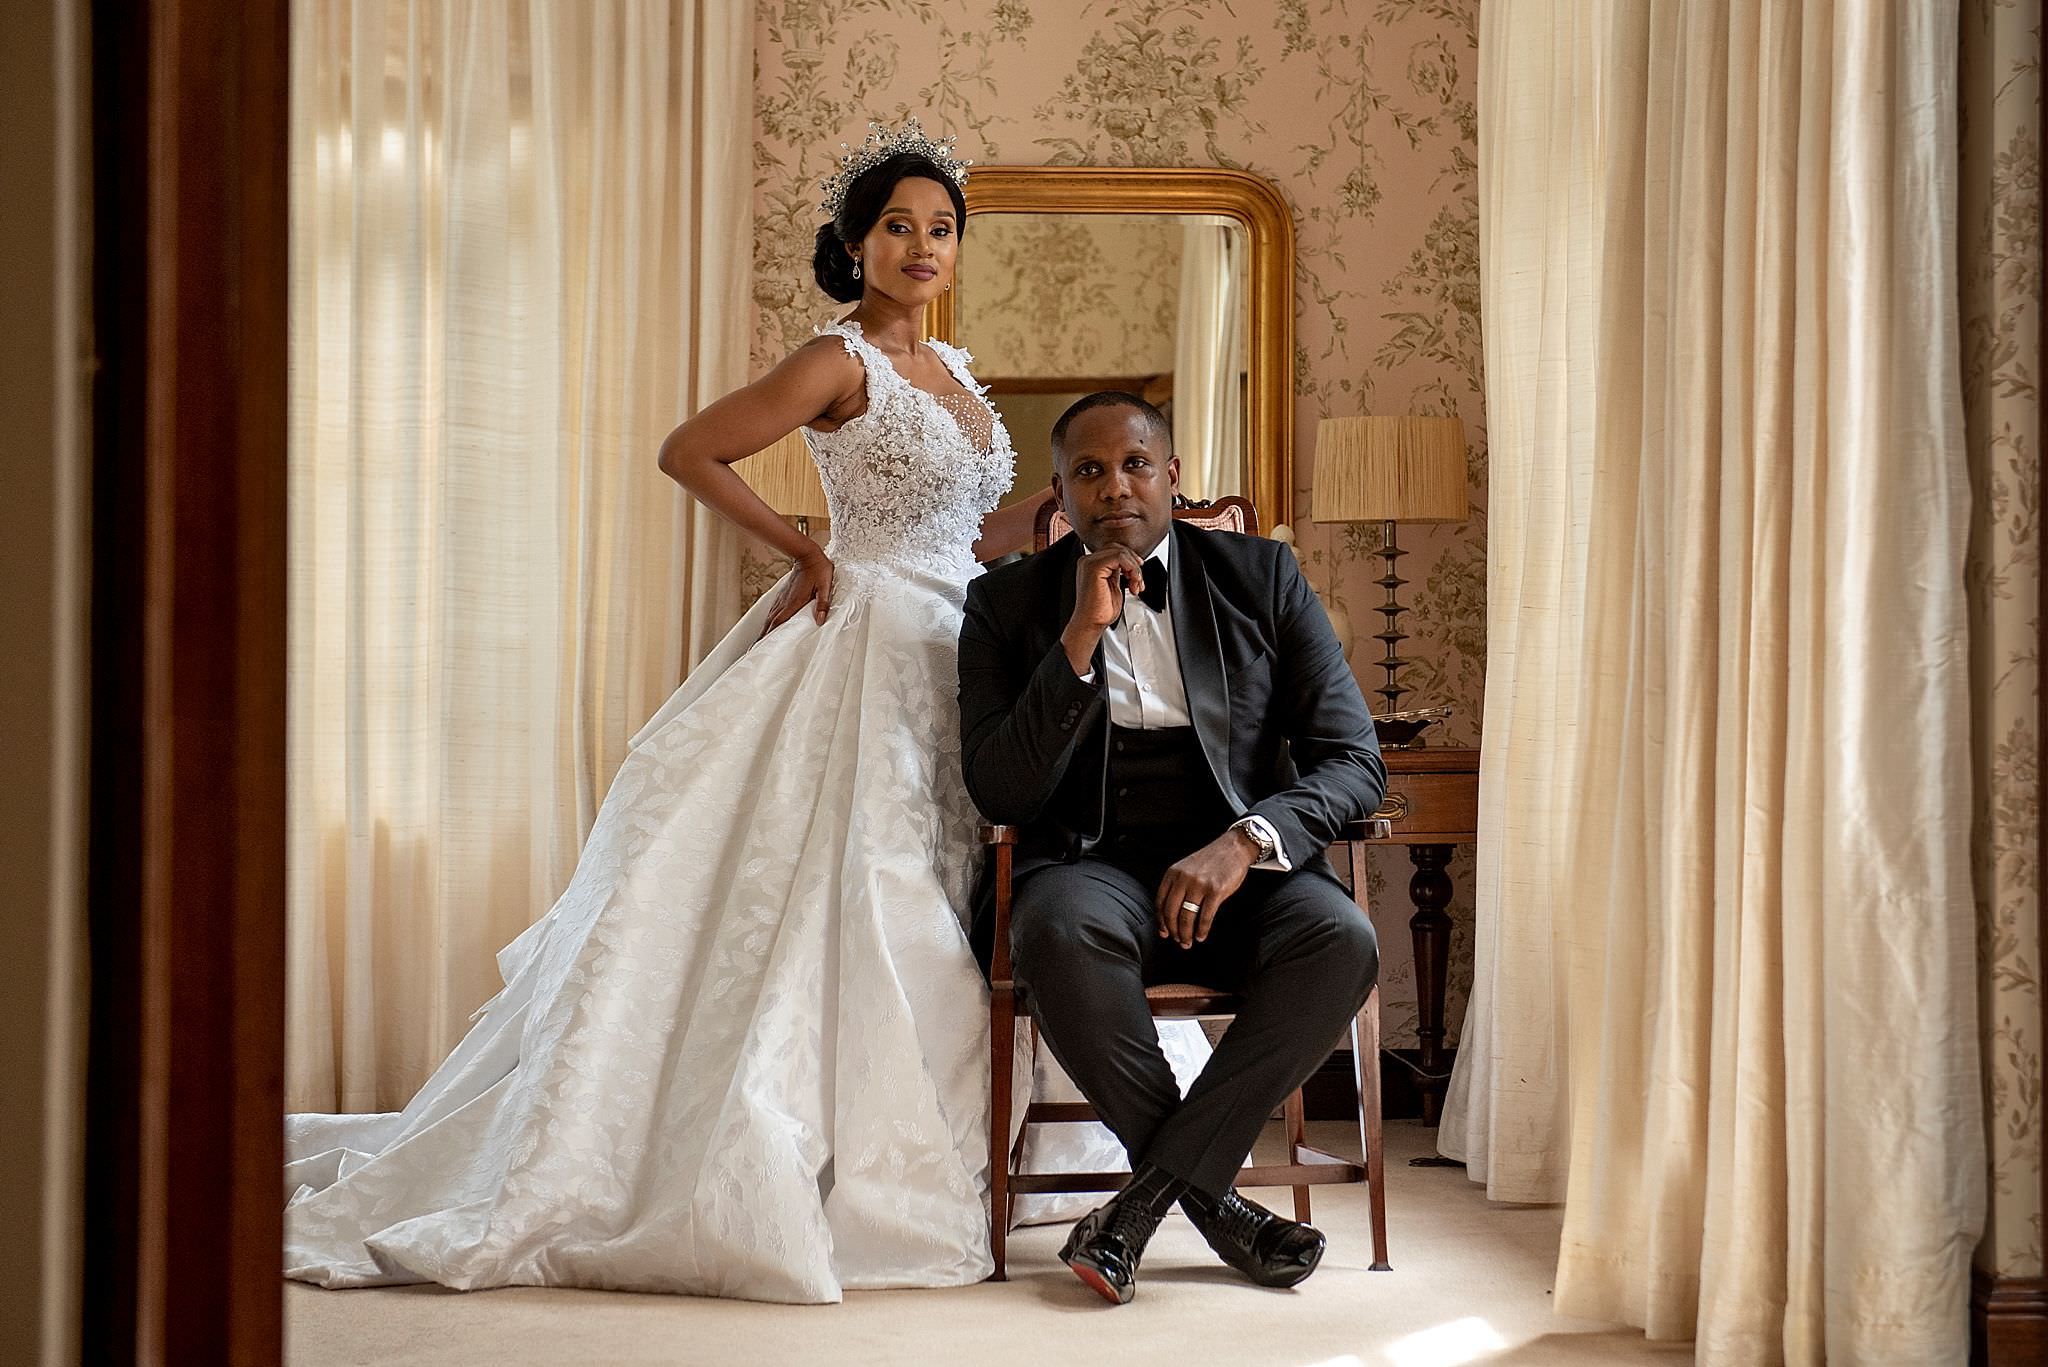 Couple portrait with drapery - photo by Jacki Bruniquel